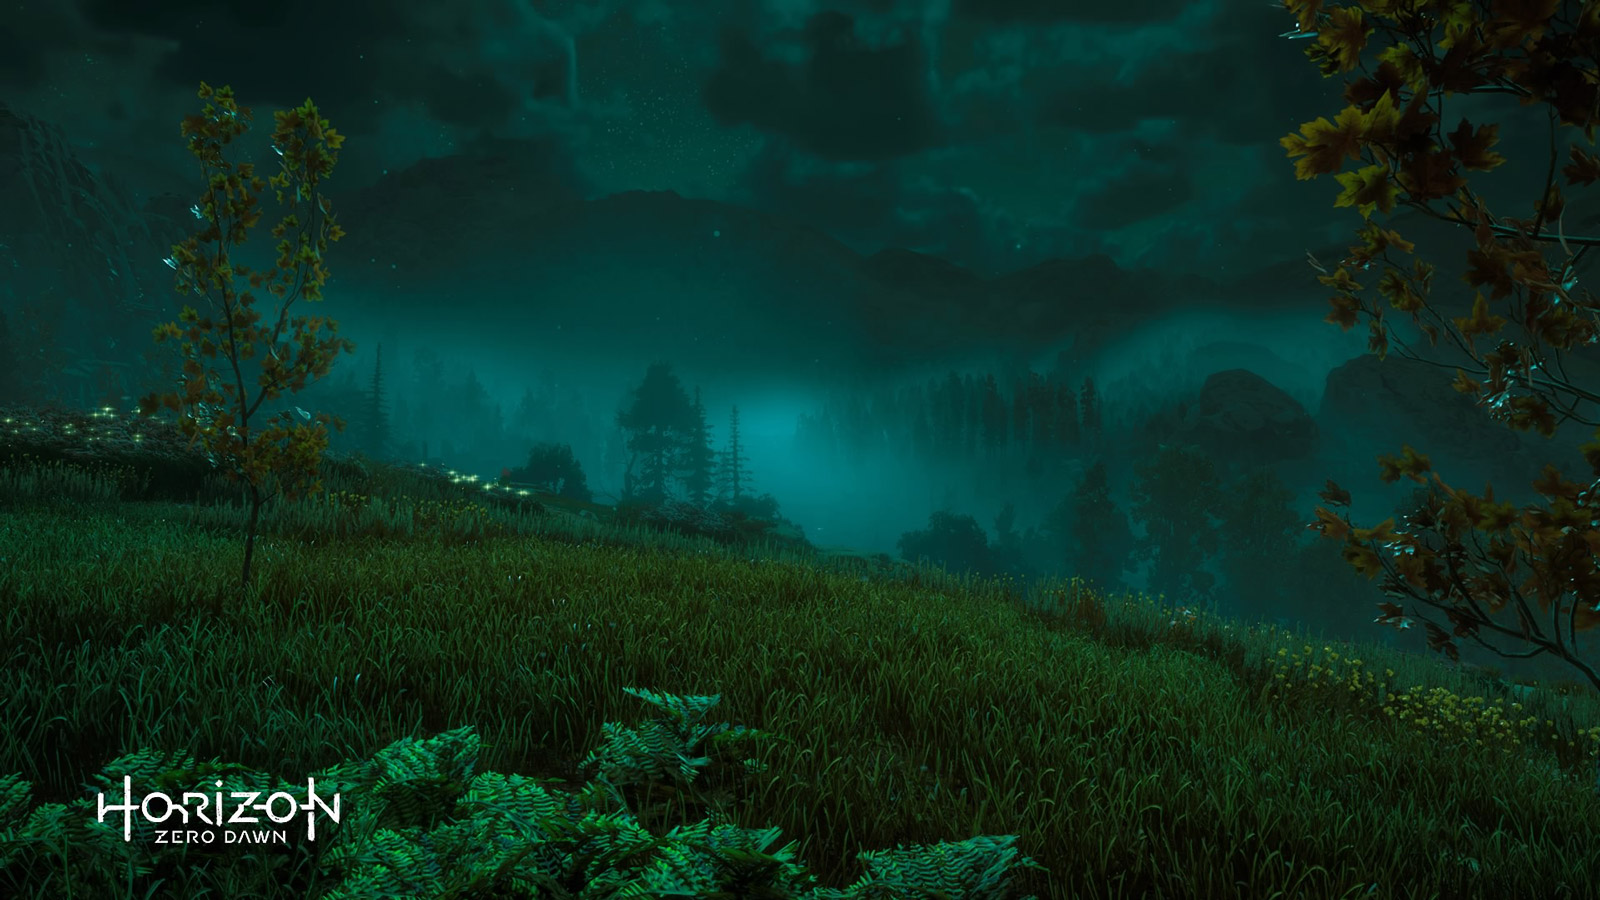 Free Horizon Zero Dawn Wallpaper in 1600x900